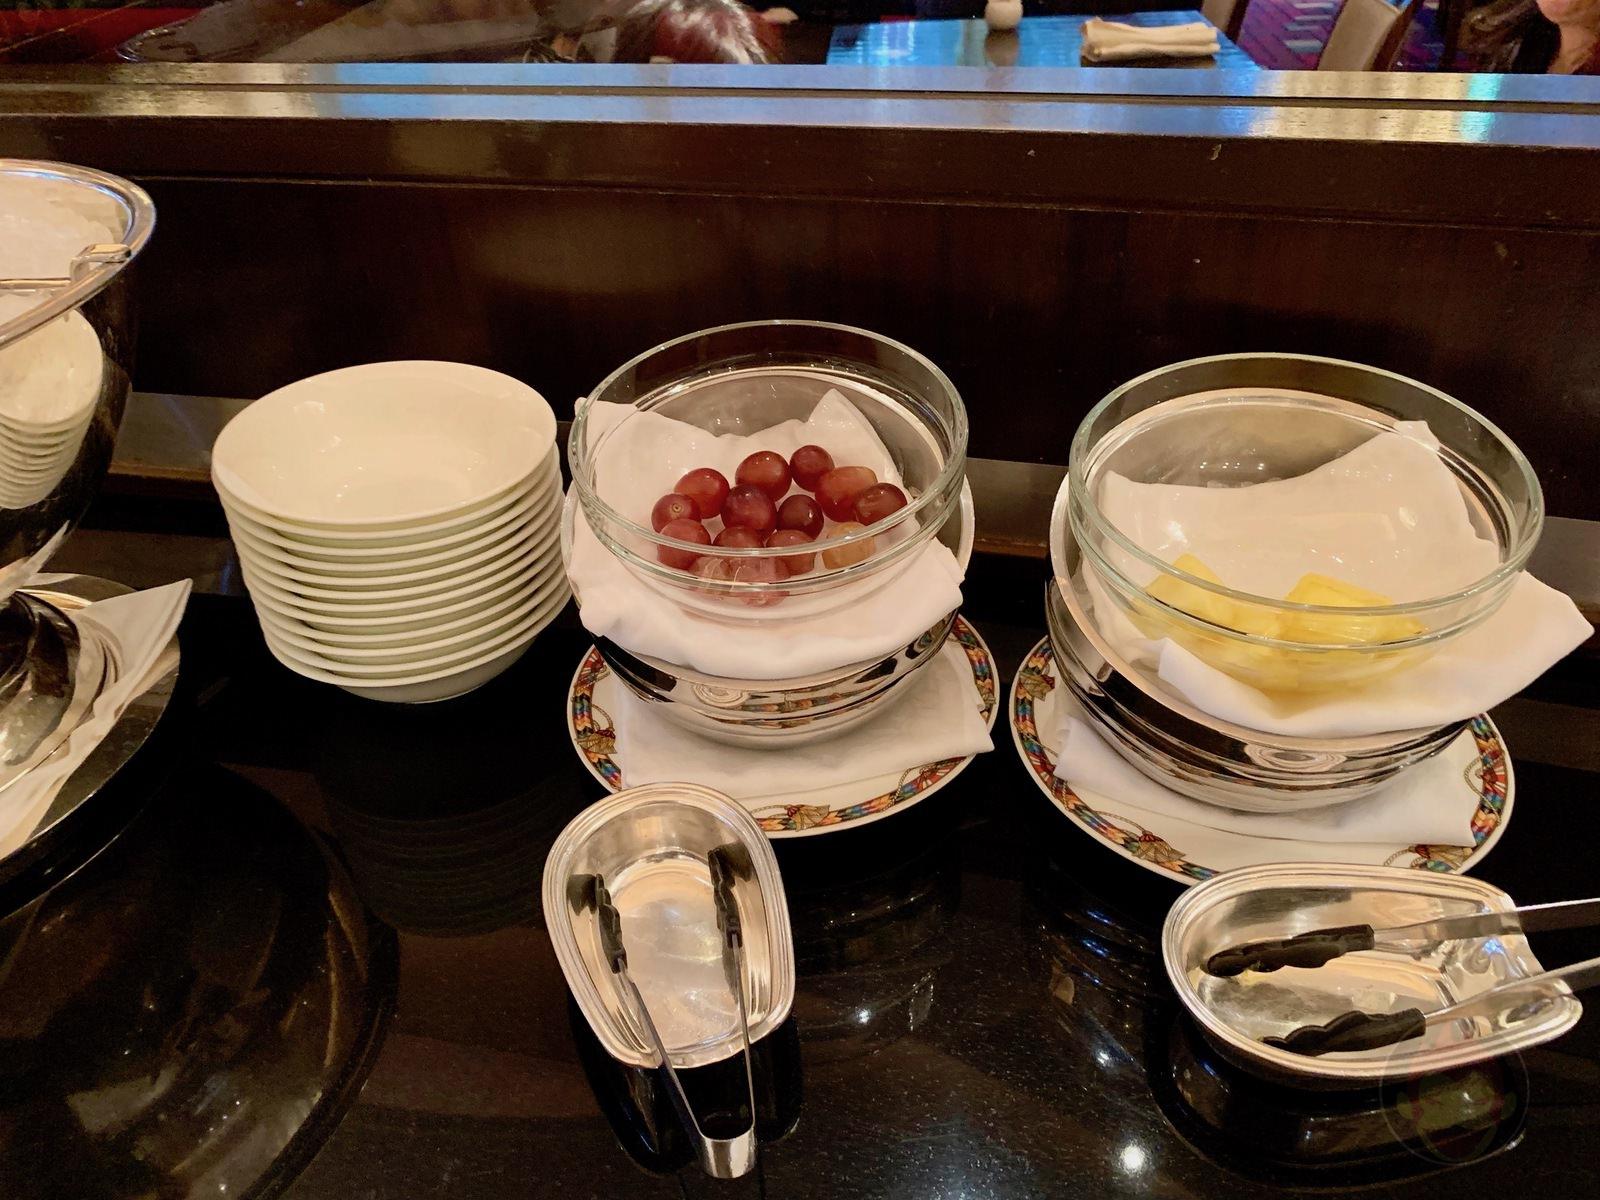 Westin tokyo theterrace lunch buffet 26